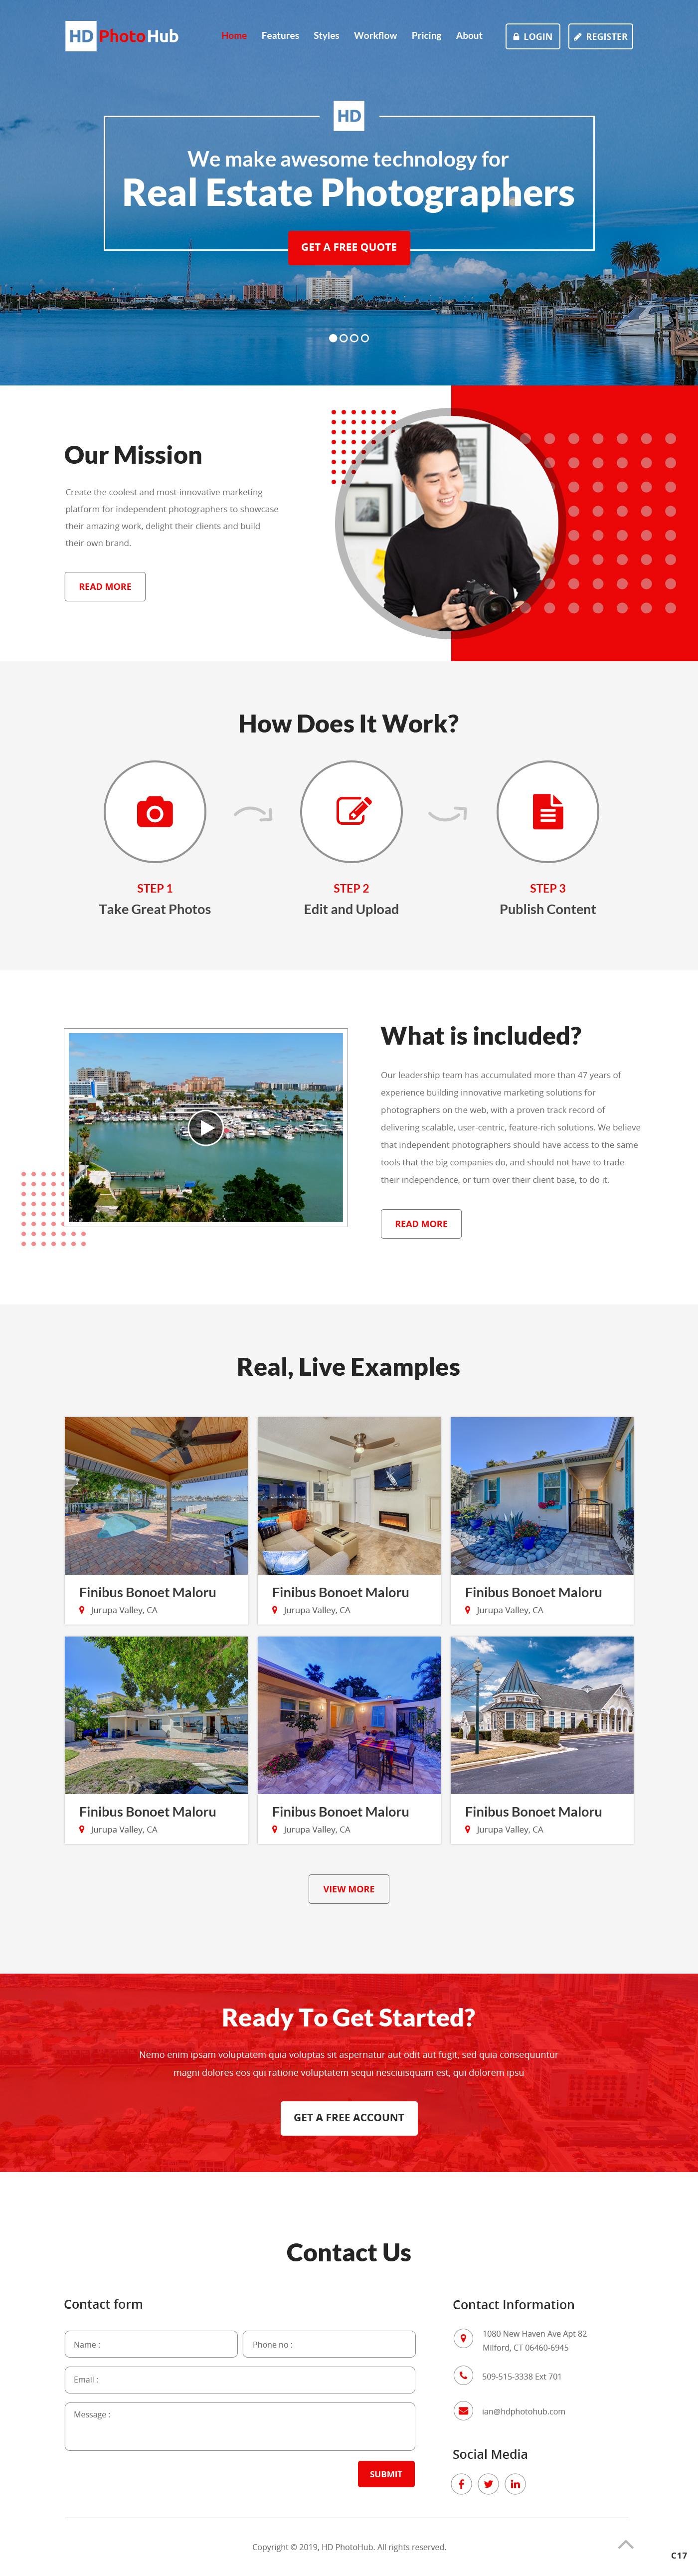 Participating Entry #5 for Website Design contest - Single Real Estate Property Listing Website Template - original